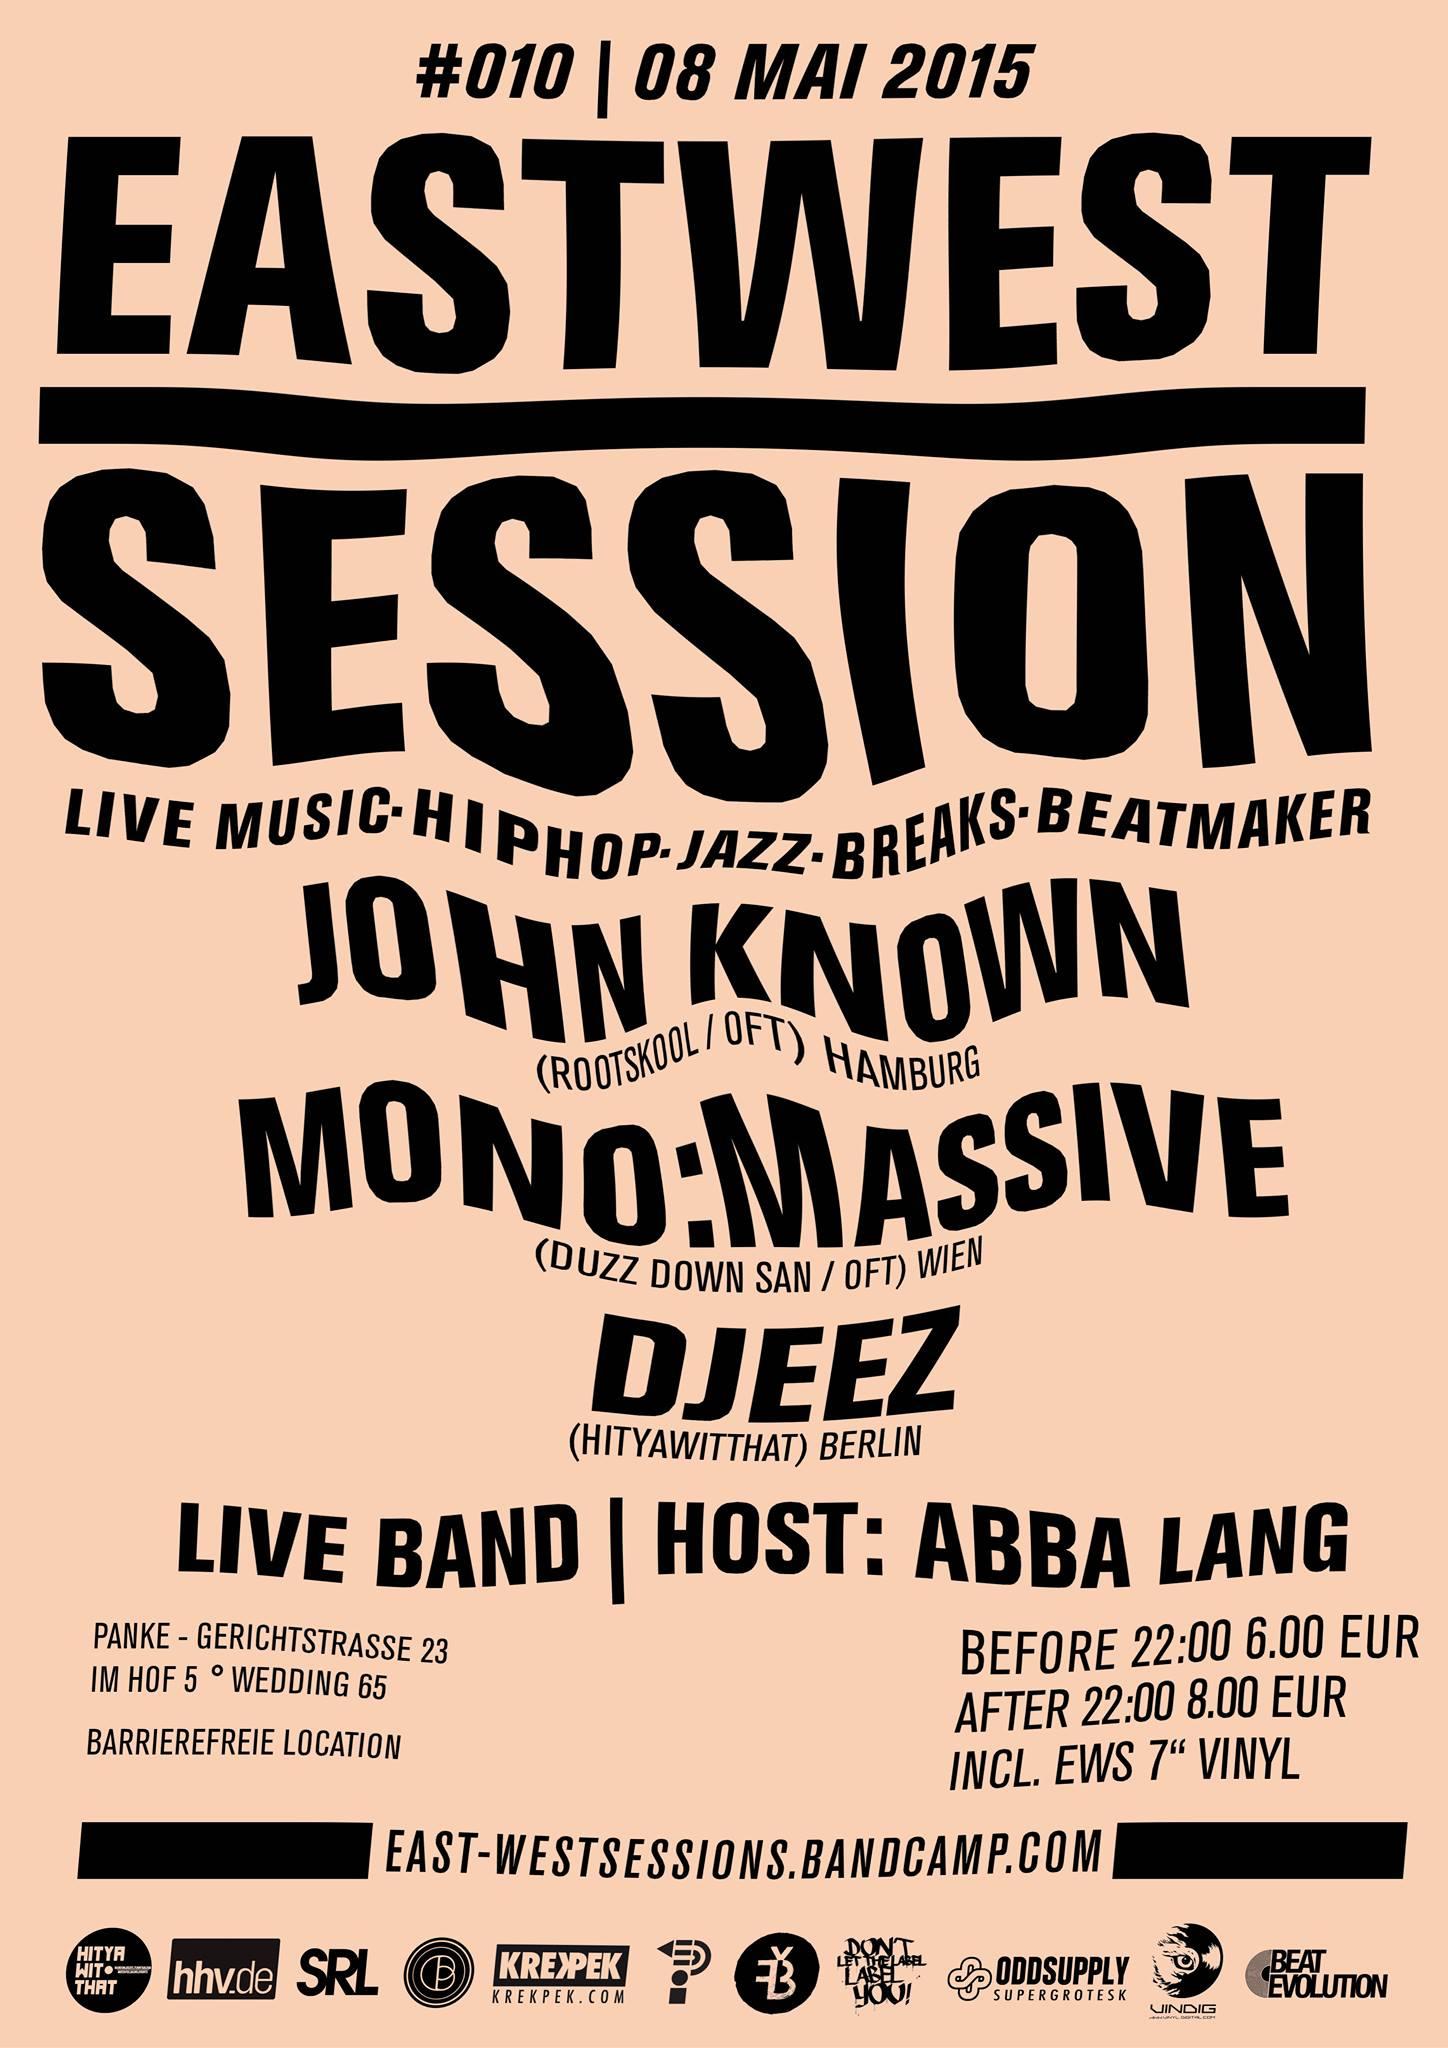 08. Mai: East-West Session #010 w/ Mono:Massive, John Known & Djeez